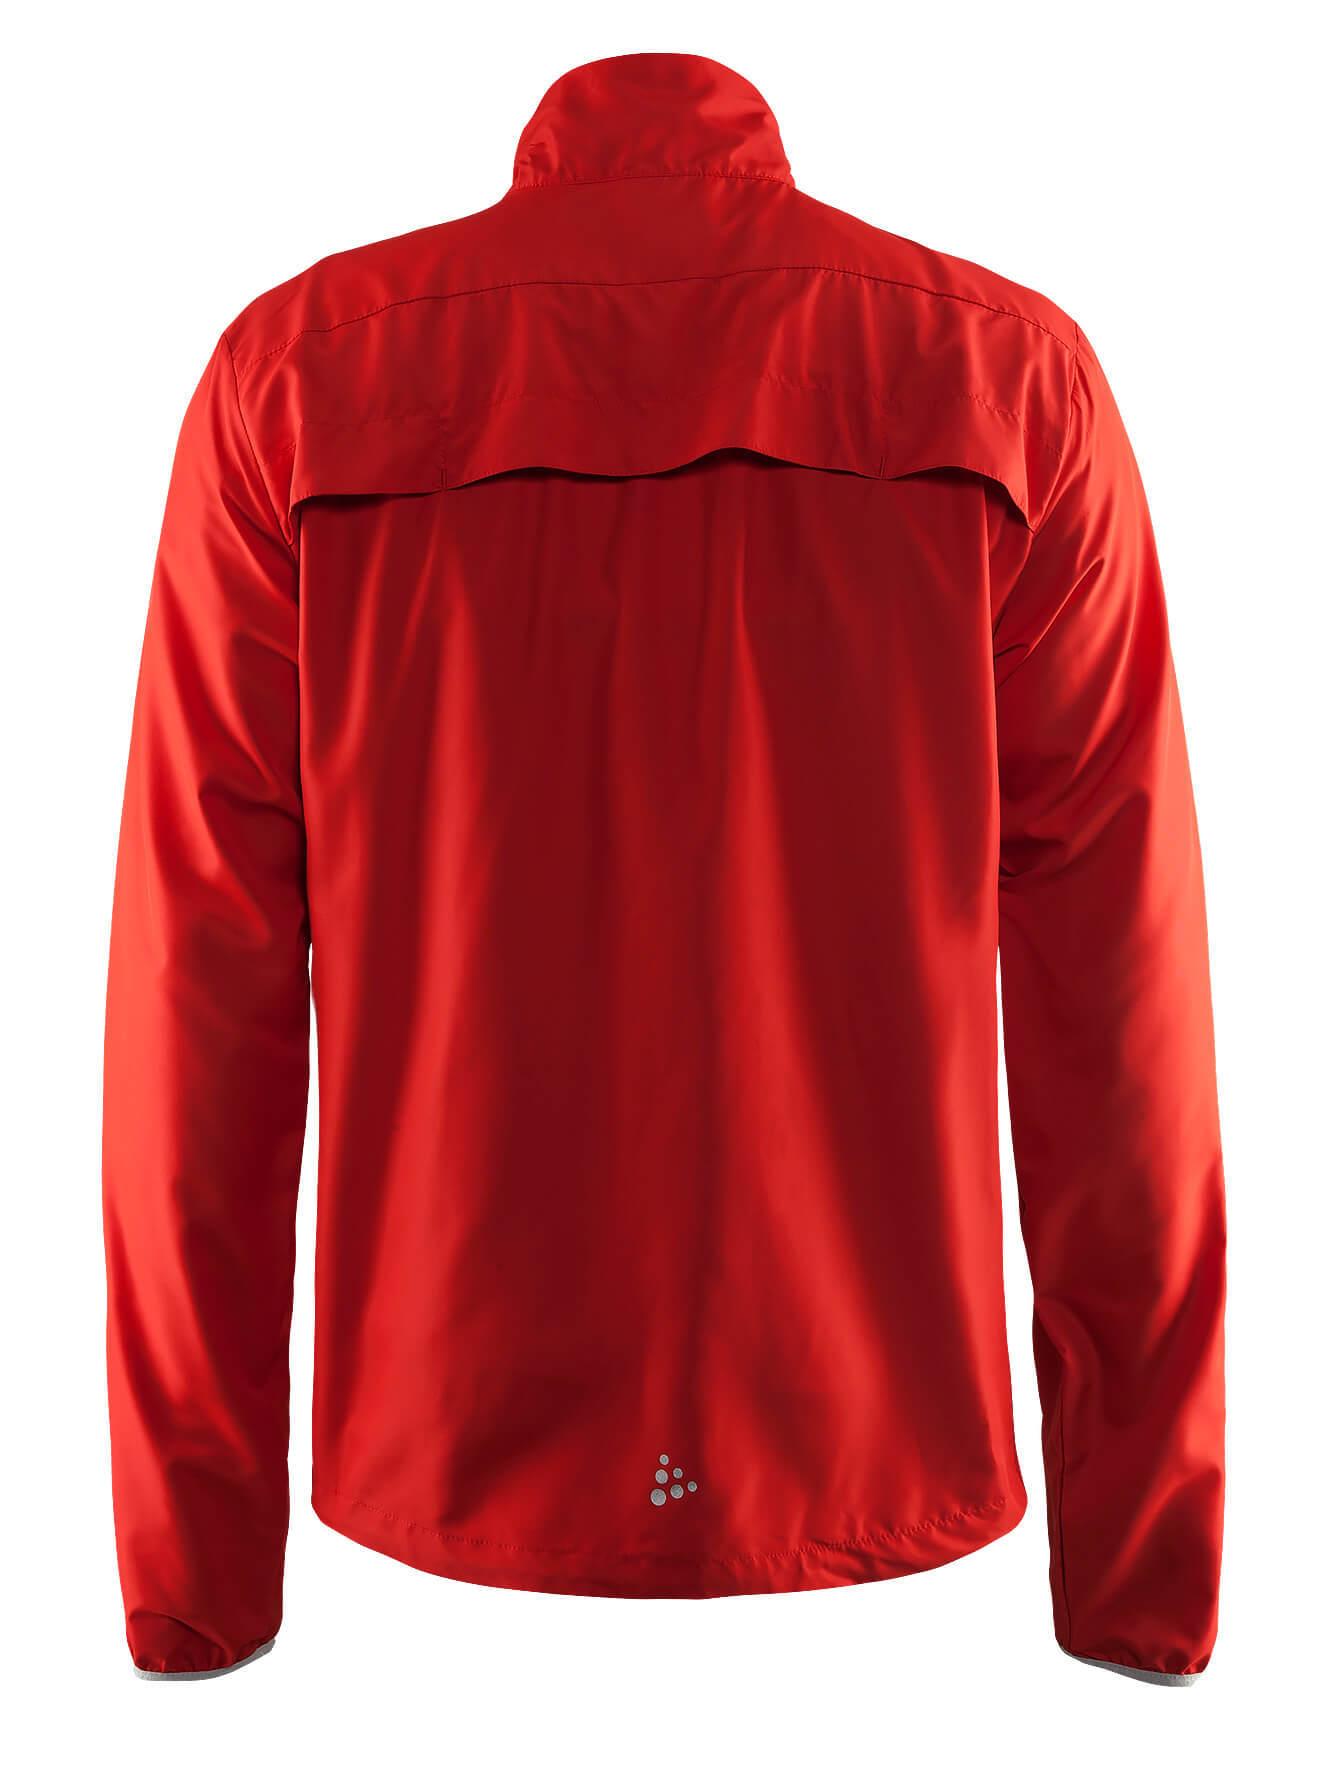 Craft Mind Run мужская беговая куртка Red - 2